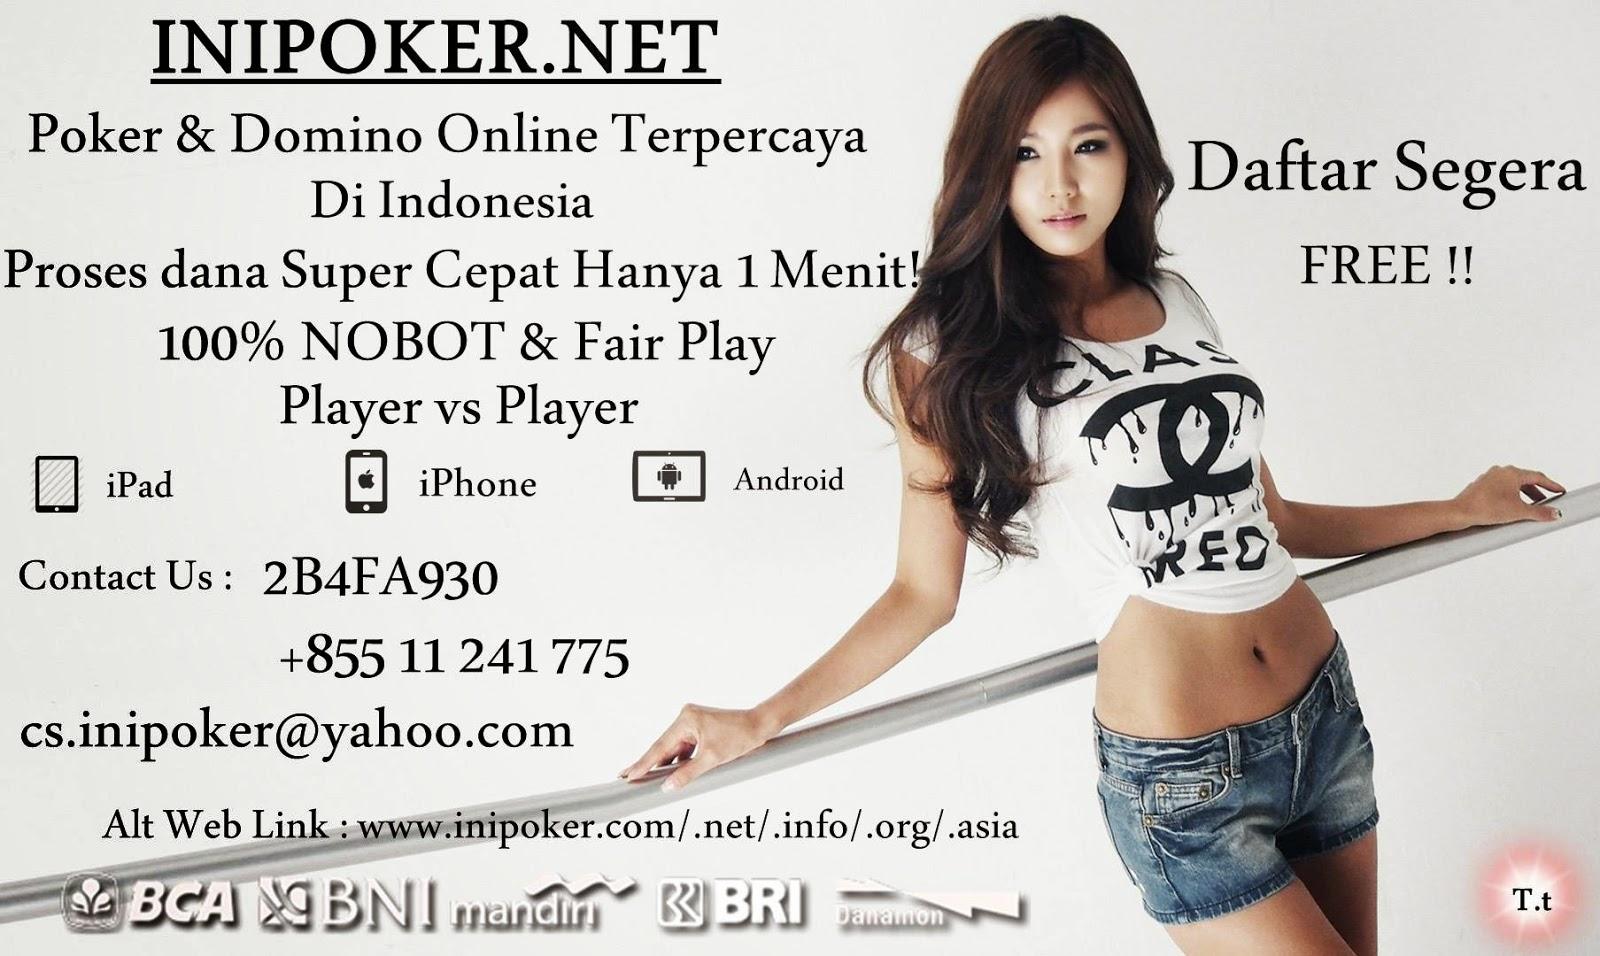 http://www.inipoker.com/?ref=717719